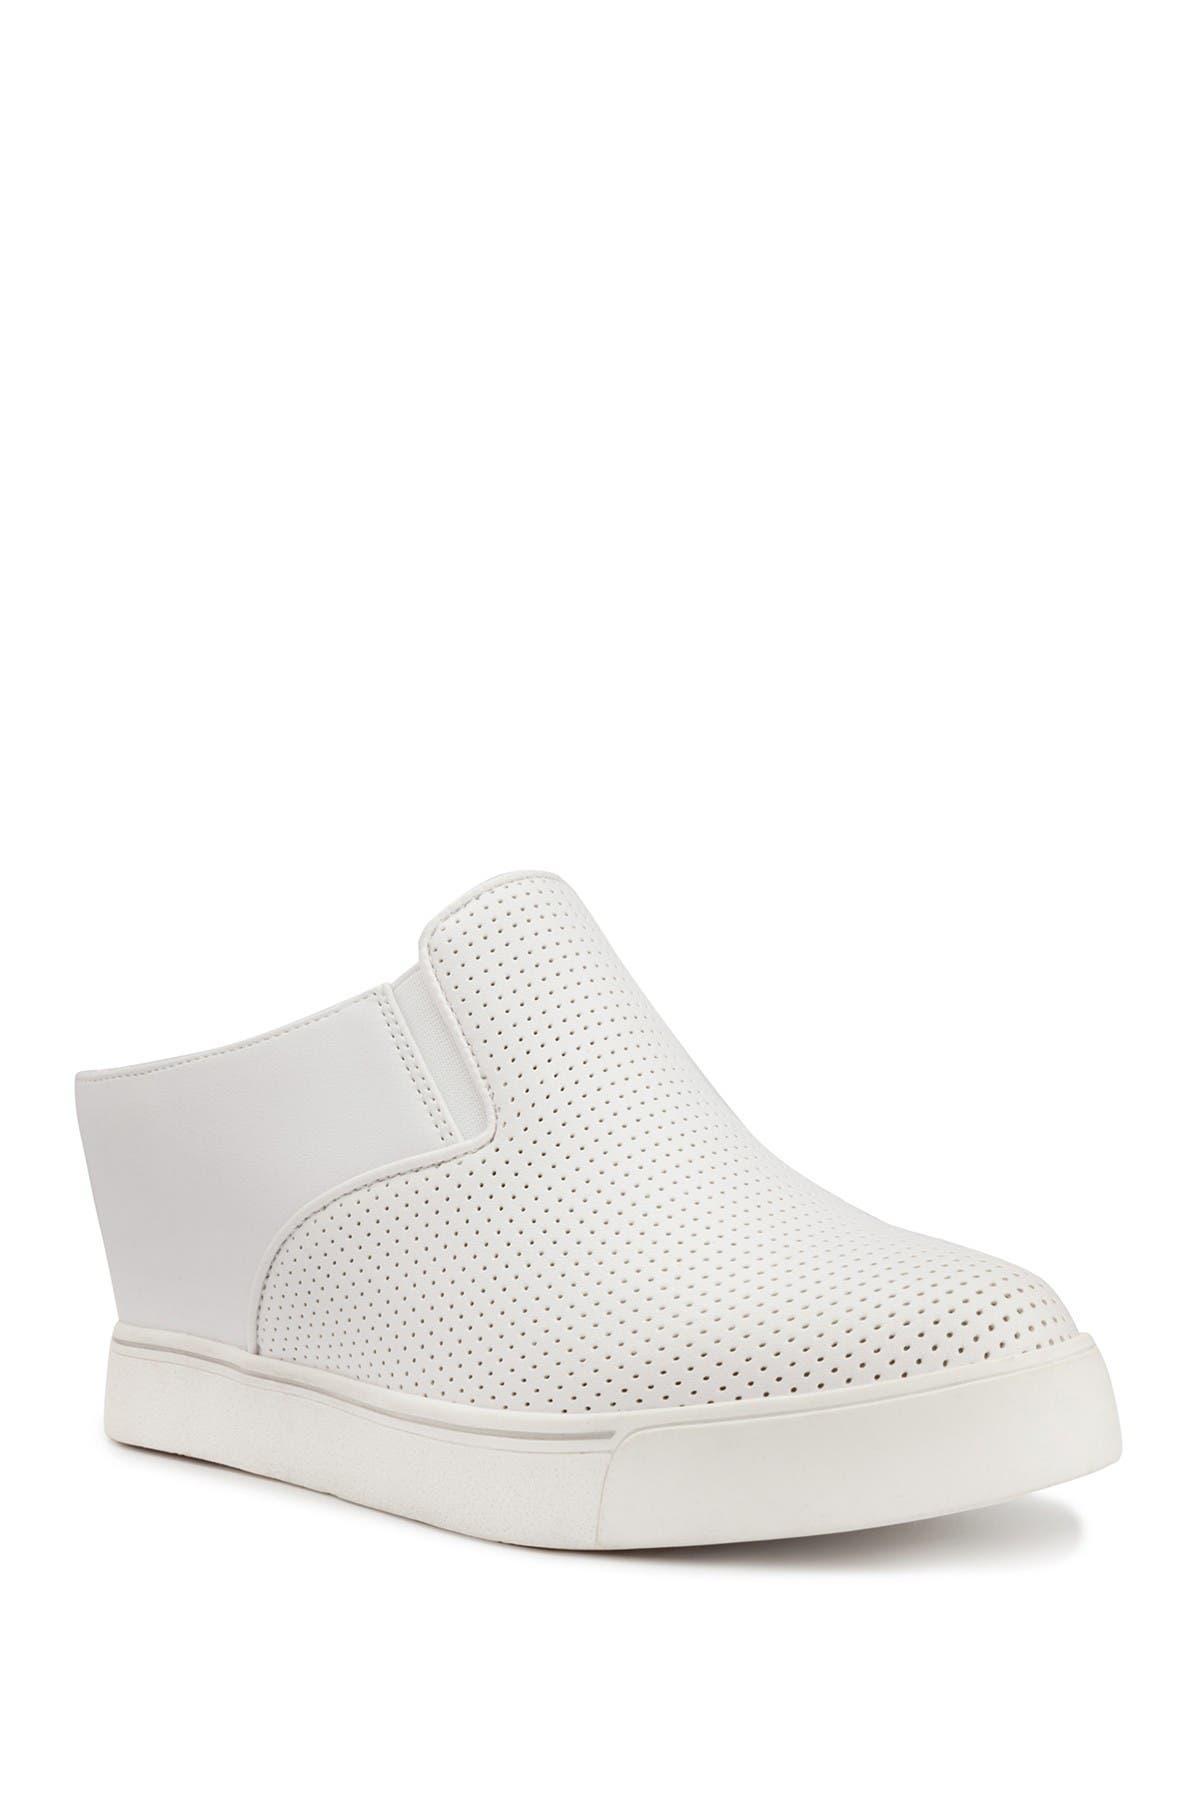 Image of Sugar Kallie Slip On Flatform Sneaker